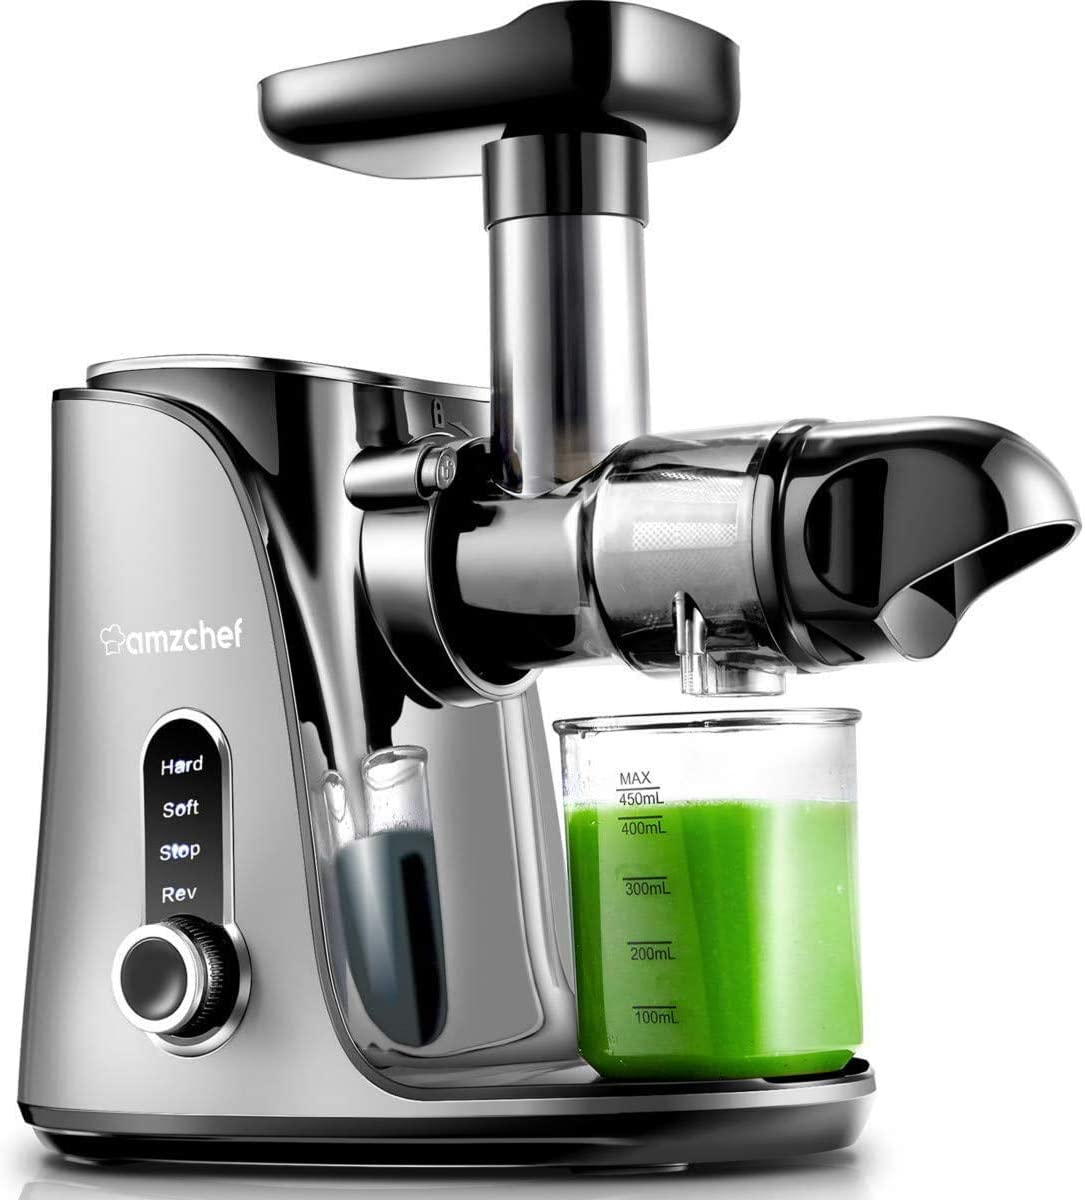 Licuadora prensada en frío, AMZCHEF licuadora de frutas y verduras, Extractor de zumos con 2 velocidades, panel de pantalla LED, 2 botellas de agua(500ML), cepillo fácil de limpiar (Plata)